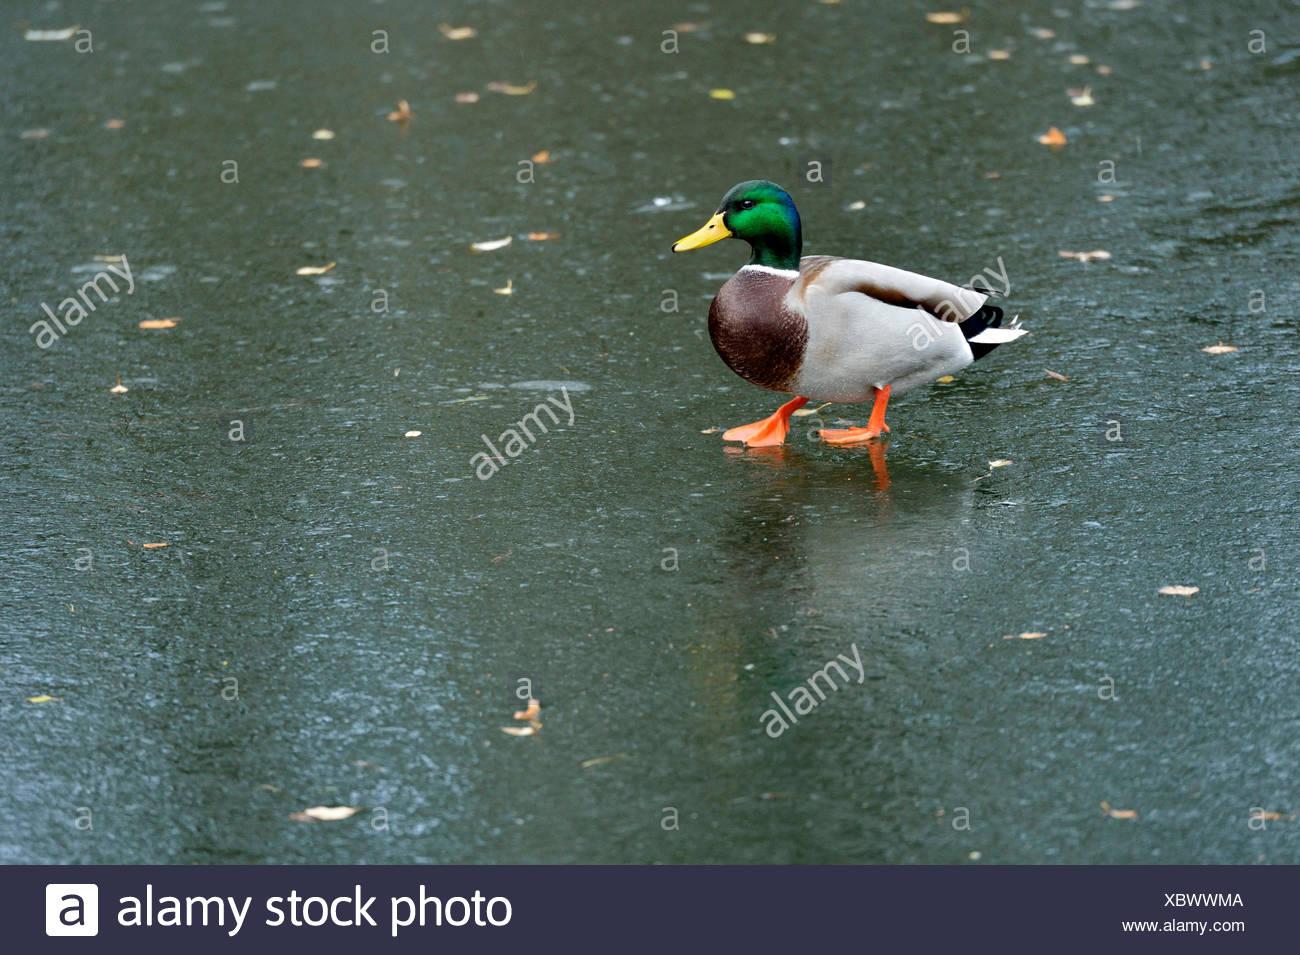 Le Canard colvert (Anas platyrhynchos), Drake, marcher sur la glace, Cham, Suisse Photo Stock